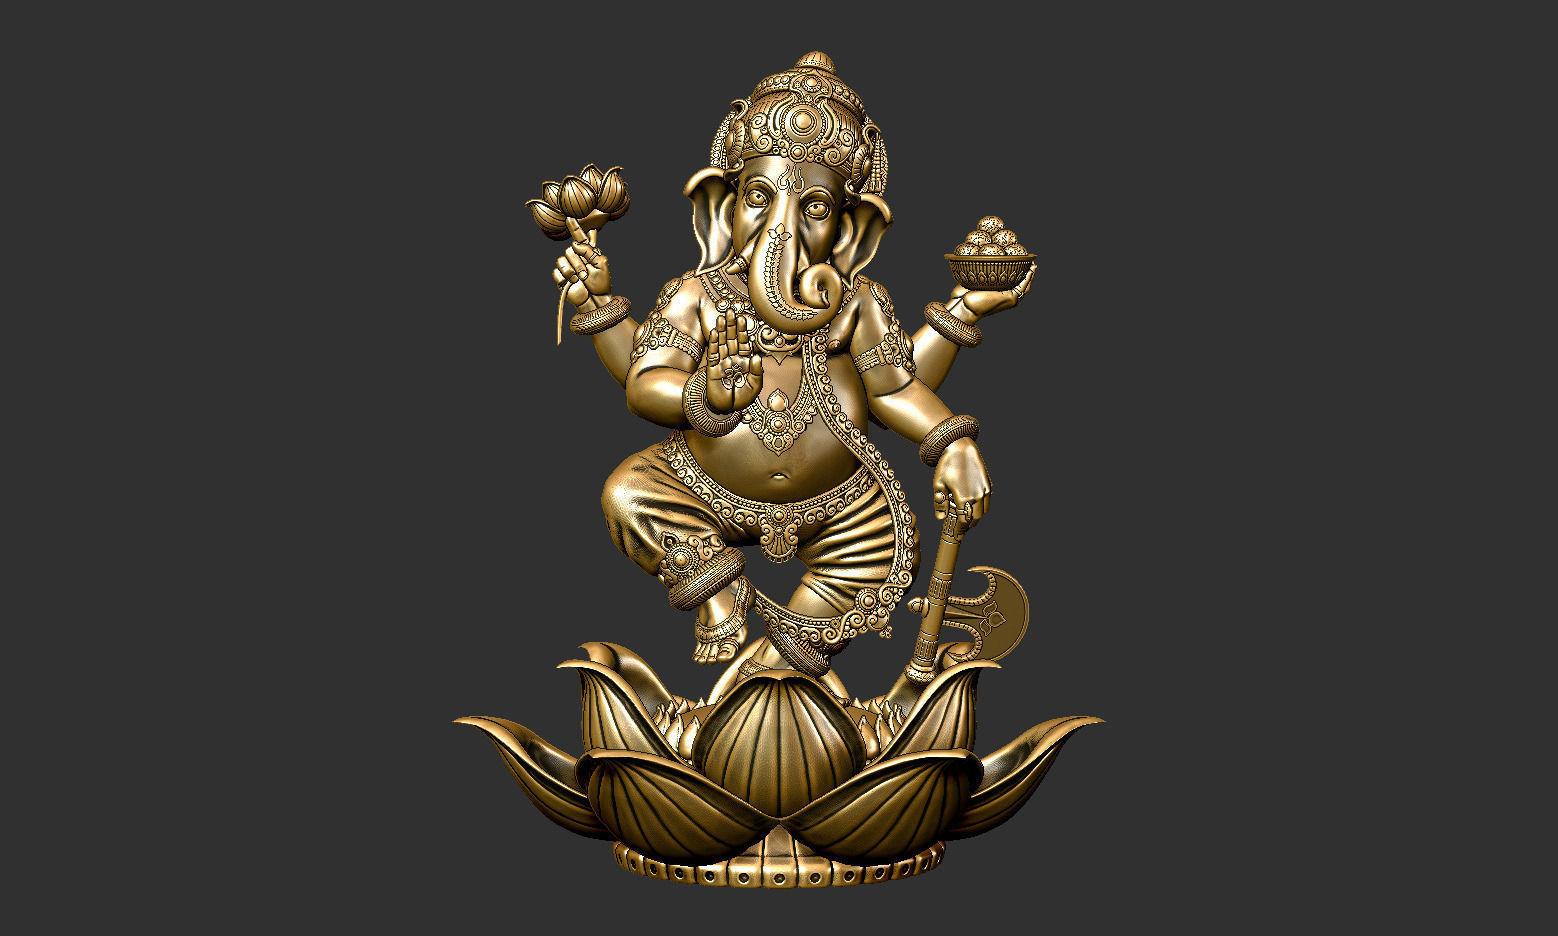 Ganesha 3d Model 3d Printable Stl